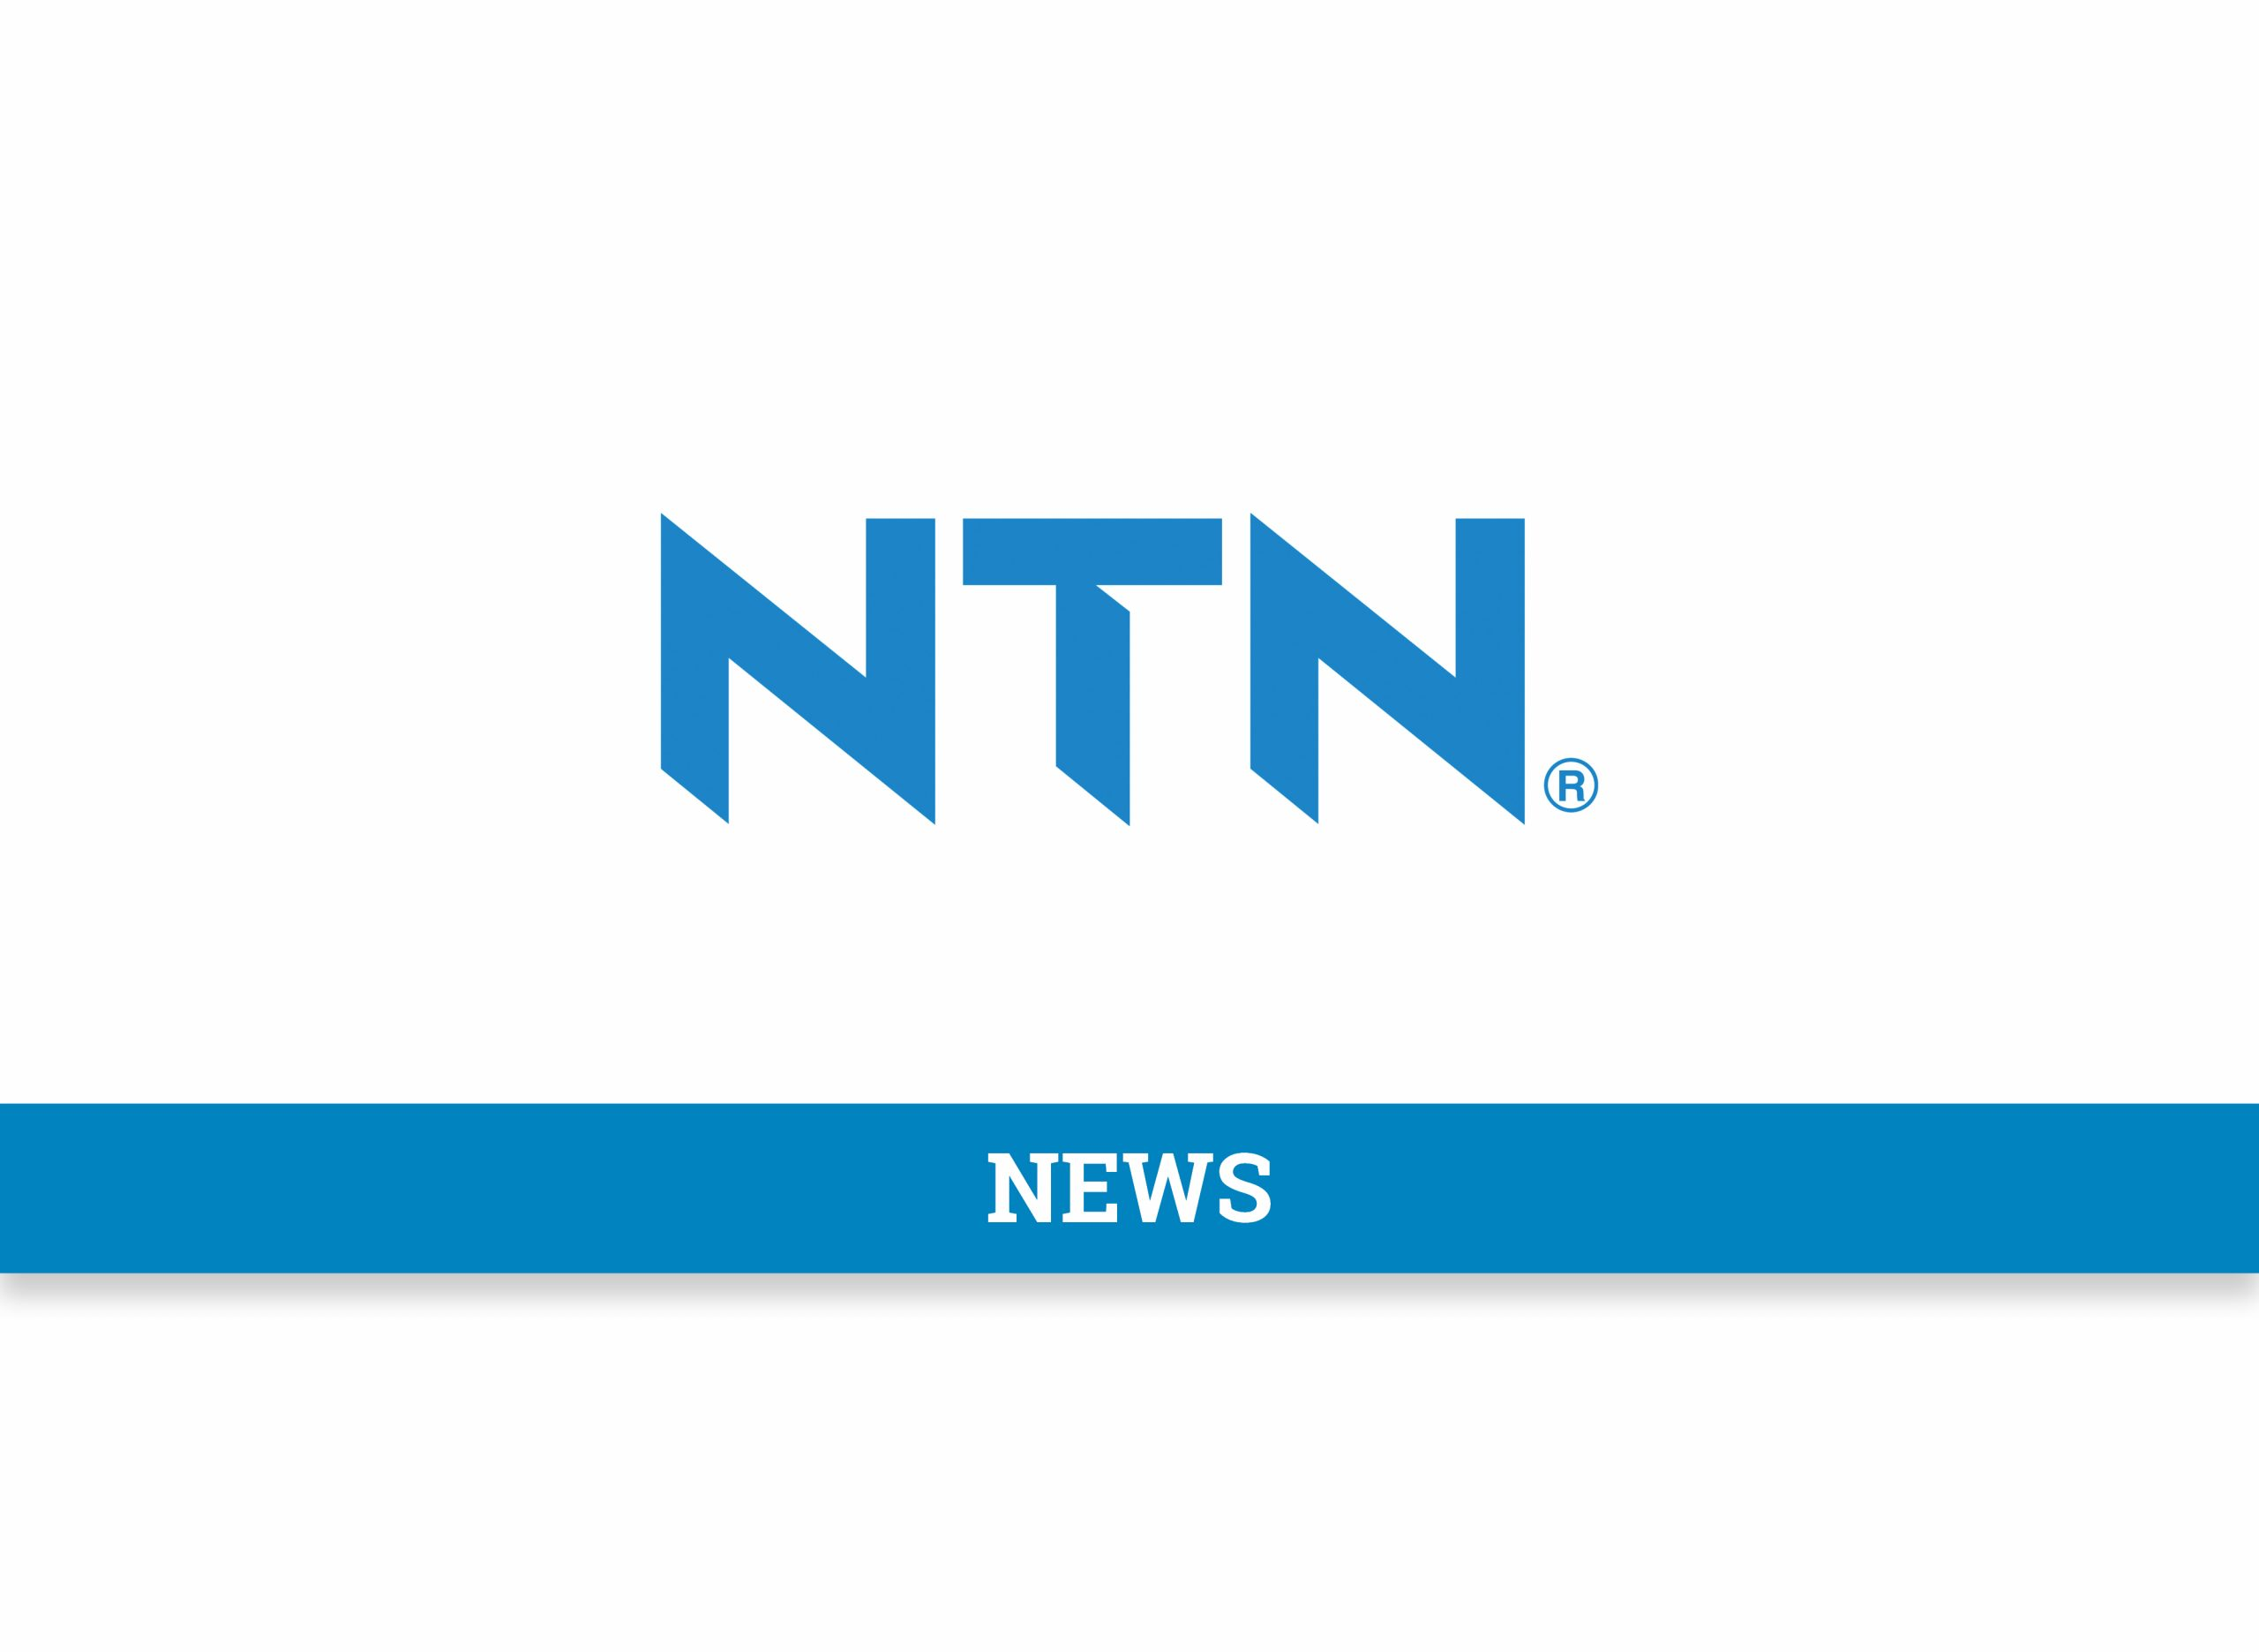 NTN News graphic image